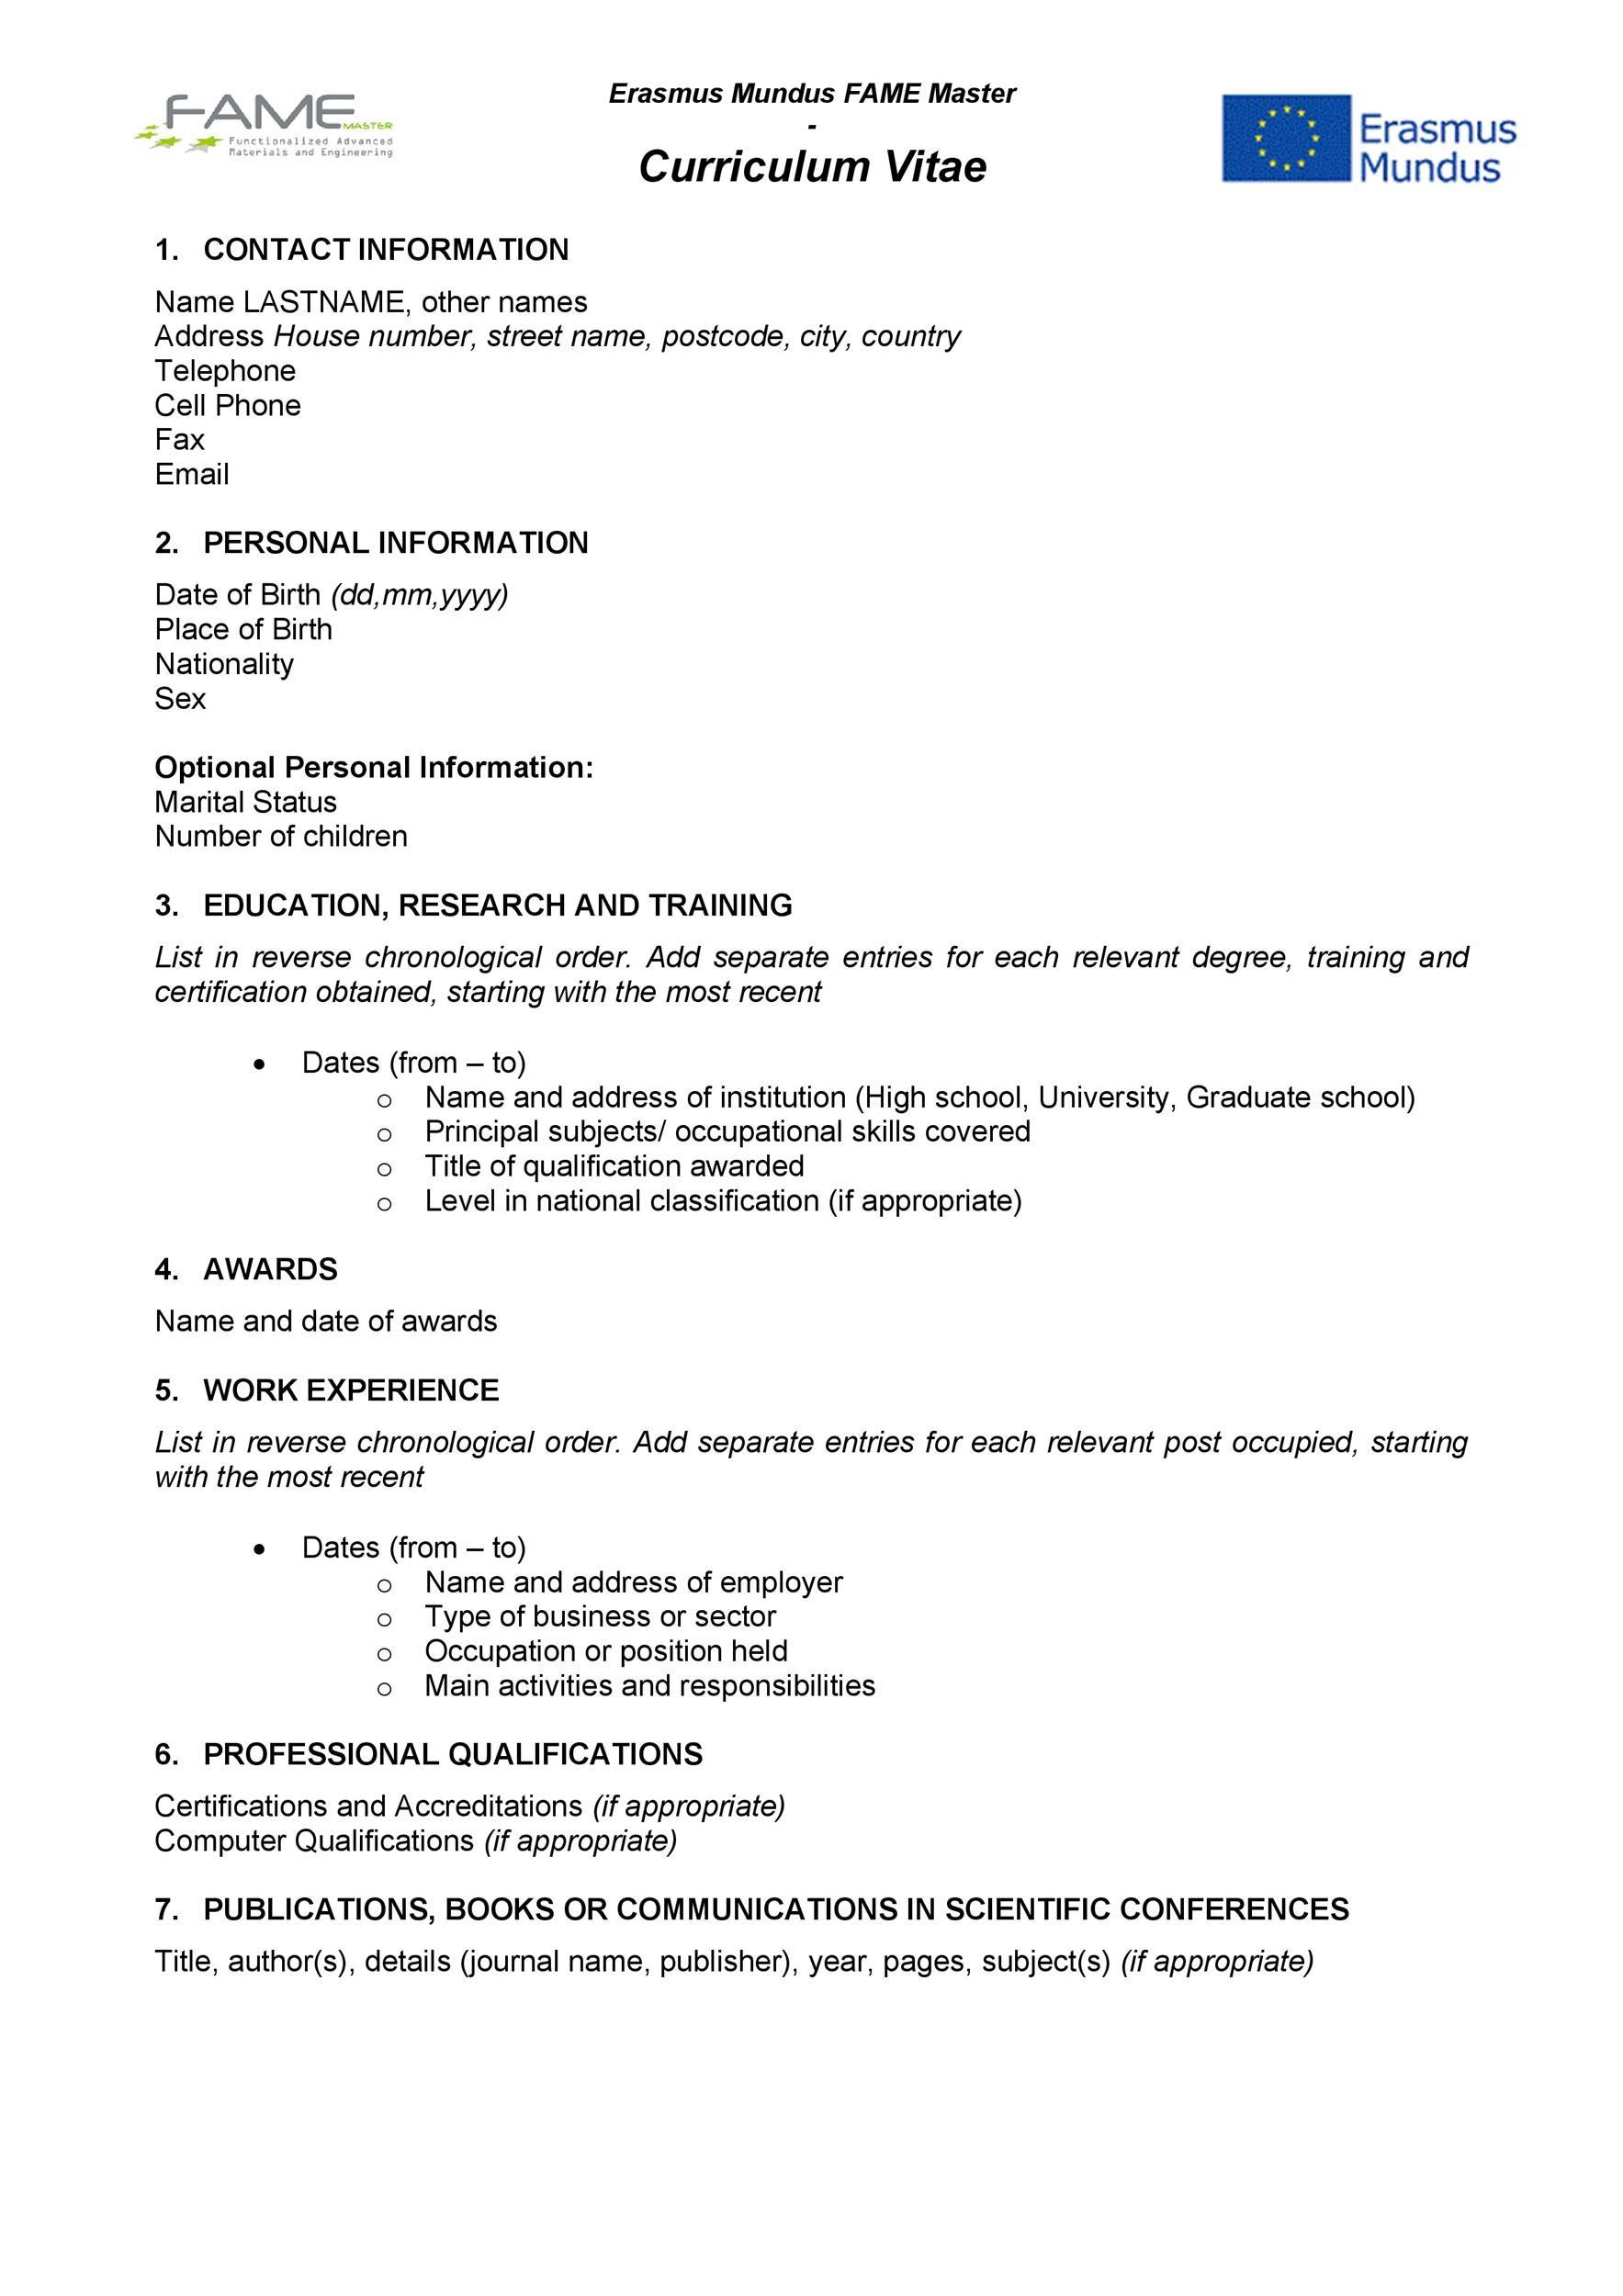 Free curriculum vitae template 07